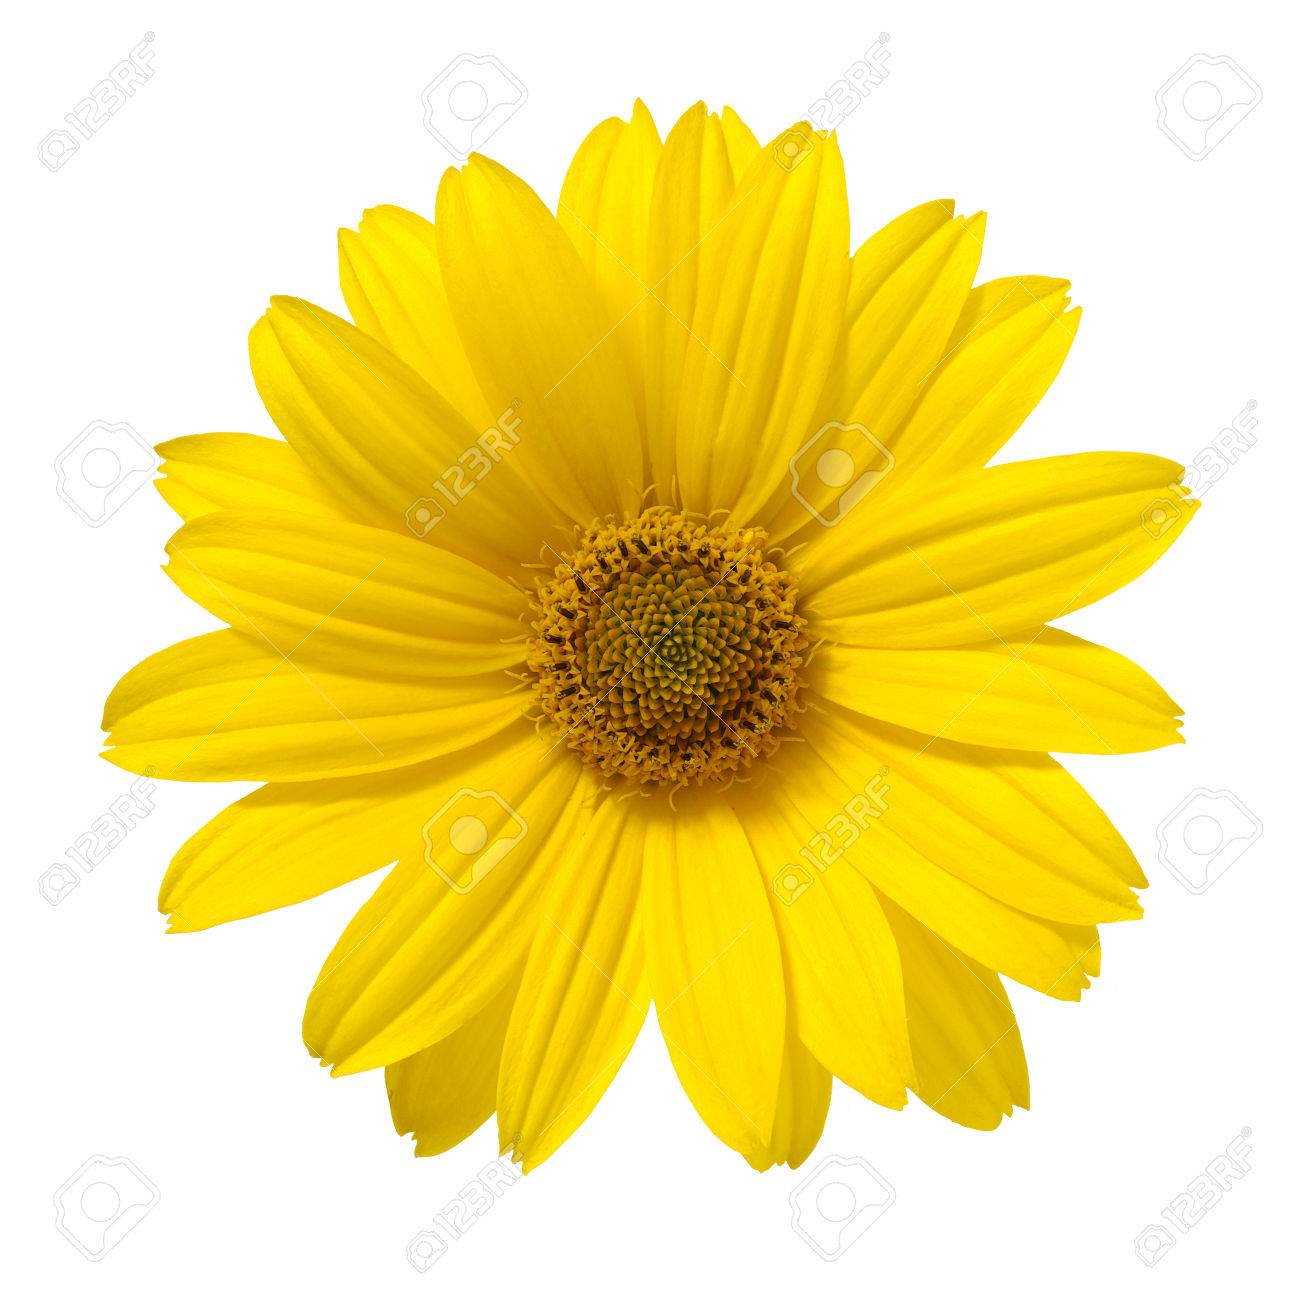 Yellow Daisy Flower Isolated On White Background Stock Photo